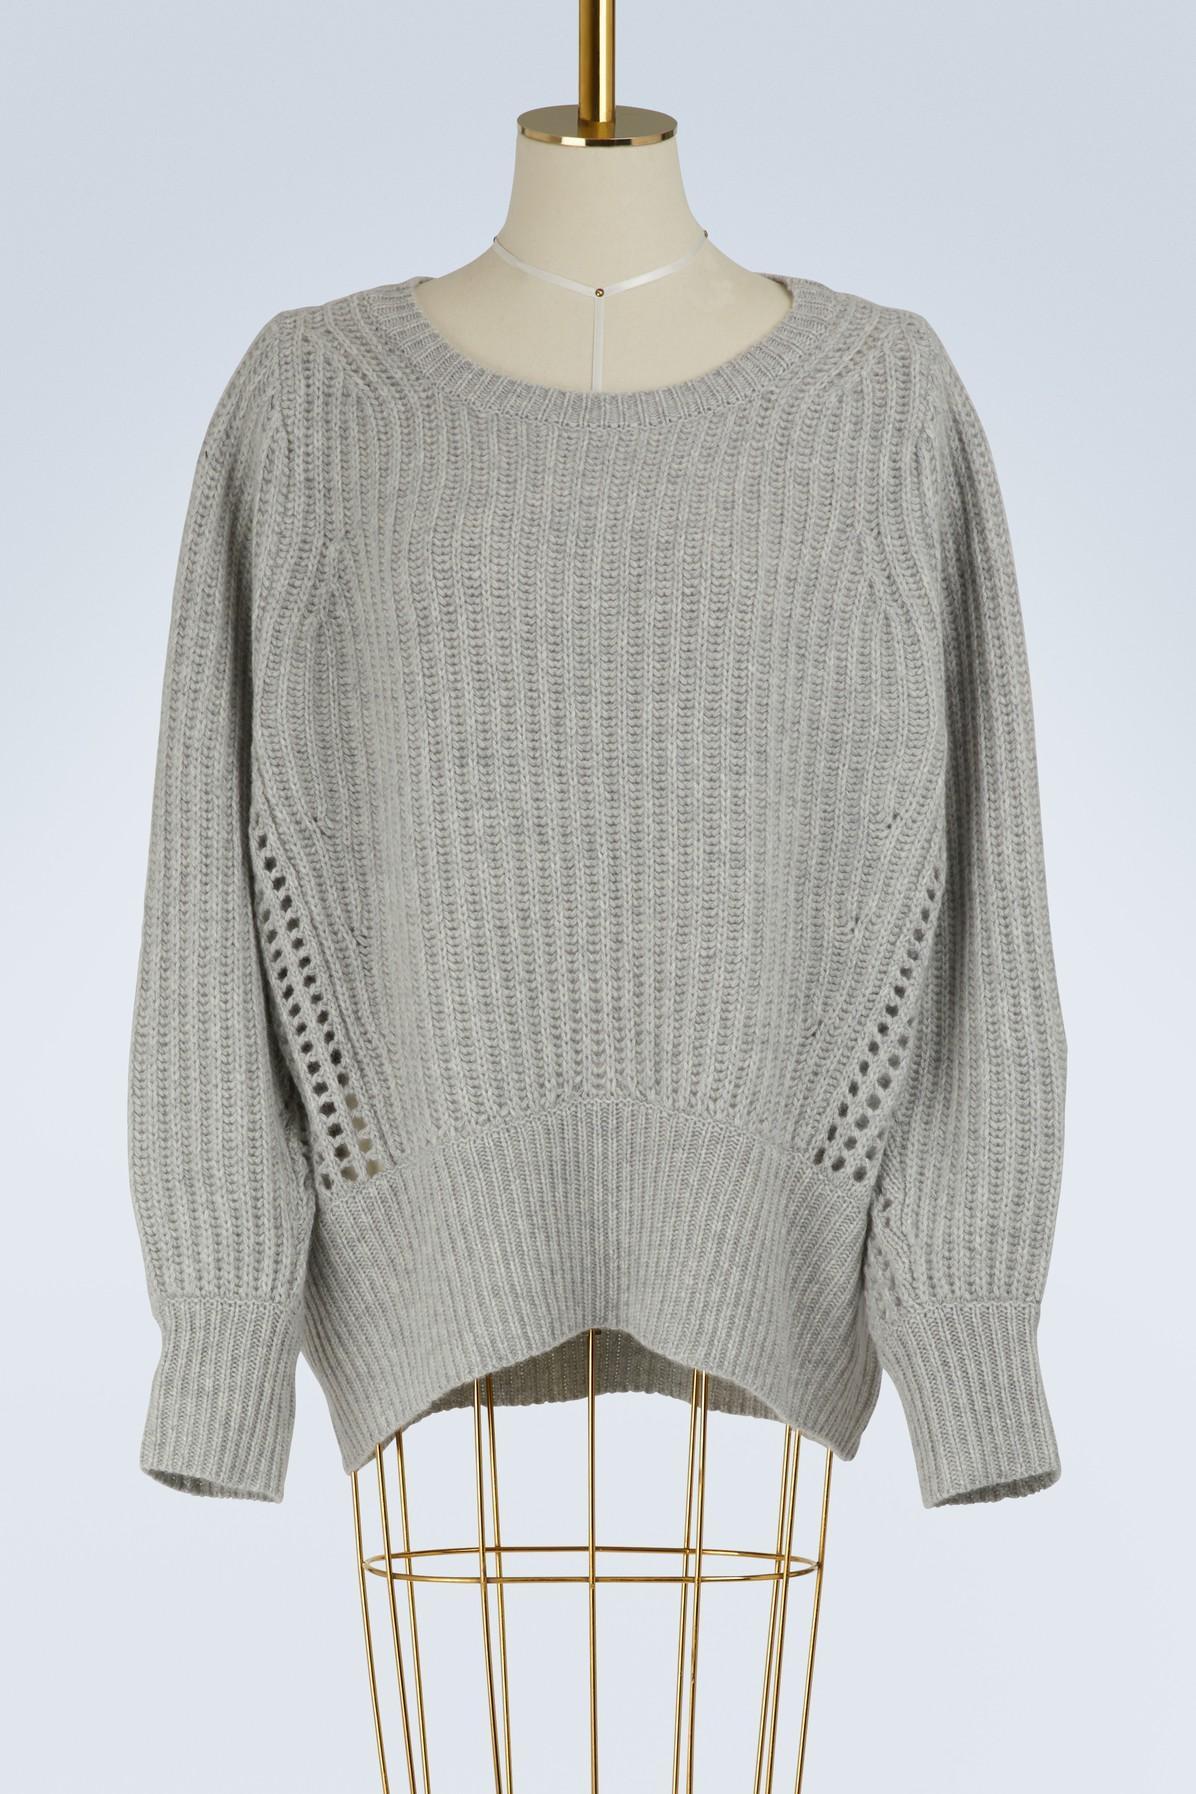 Rag & Bone Athena Crew Neck Sweater In Lt Grey